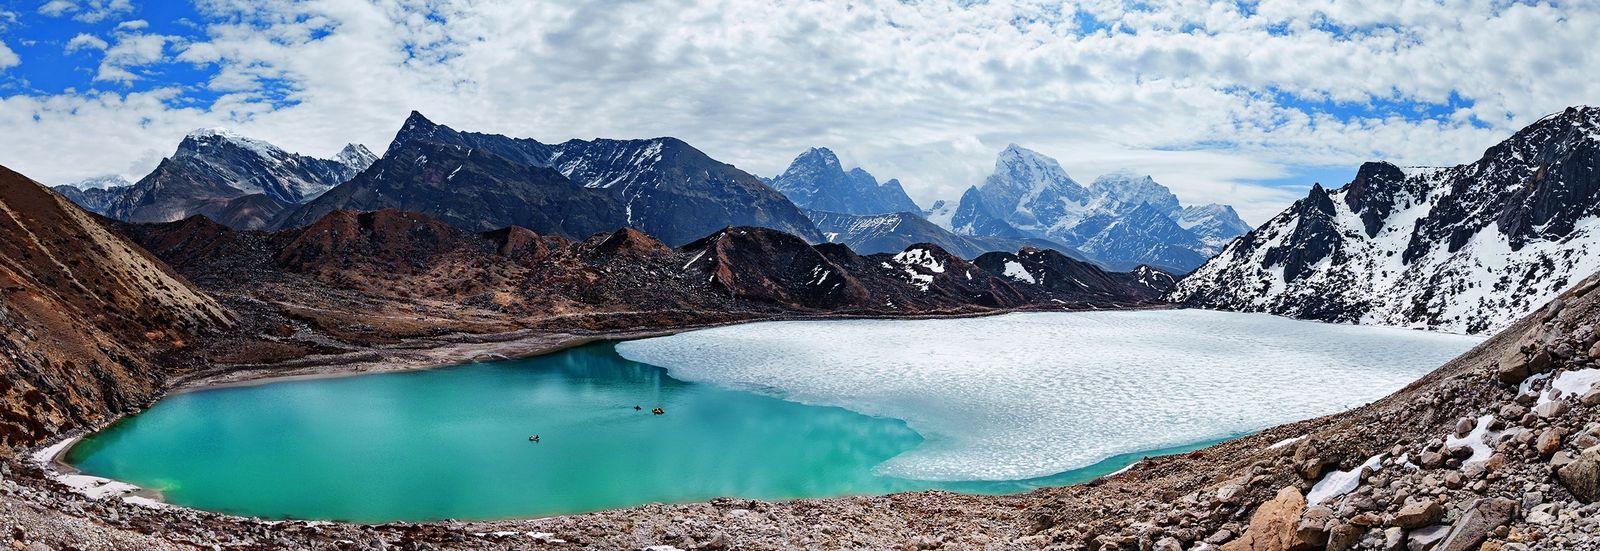 Gletscher im Himalaja